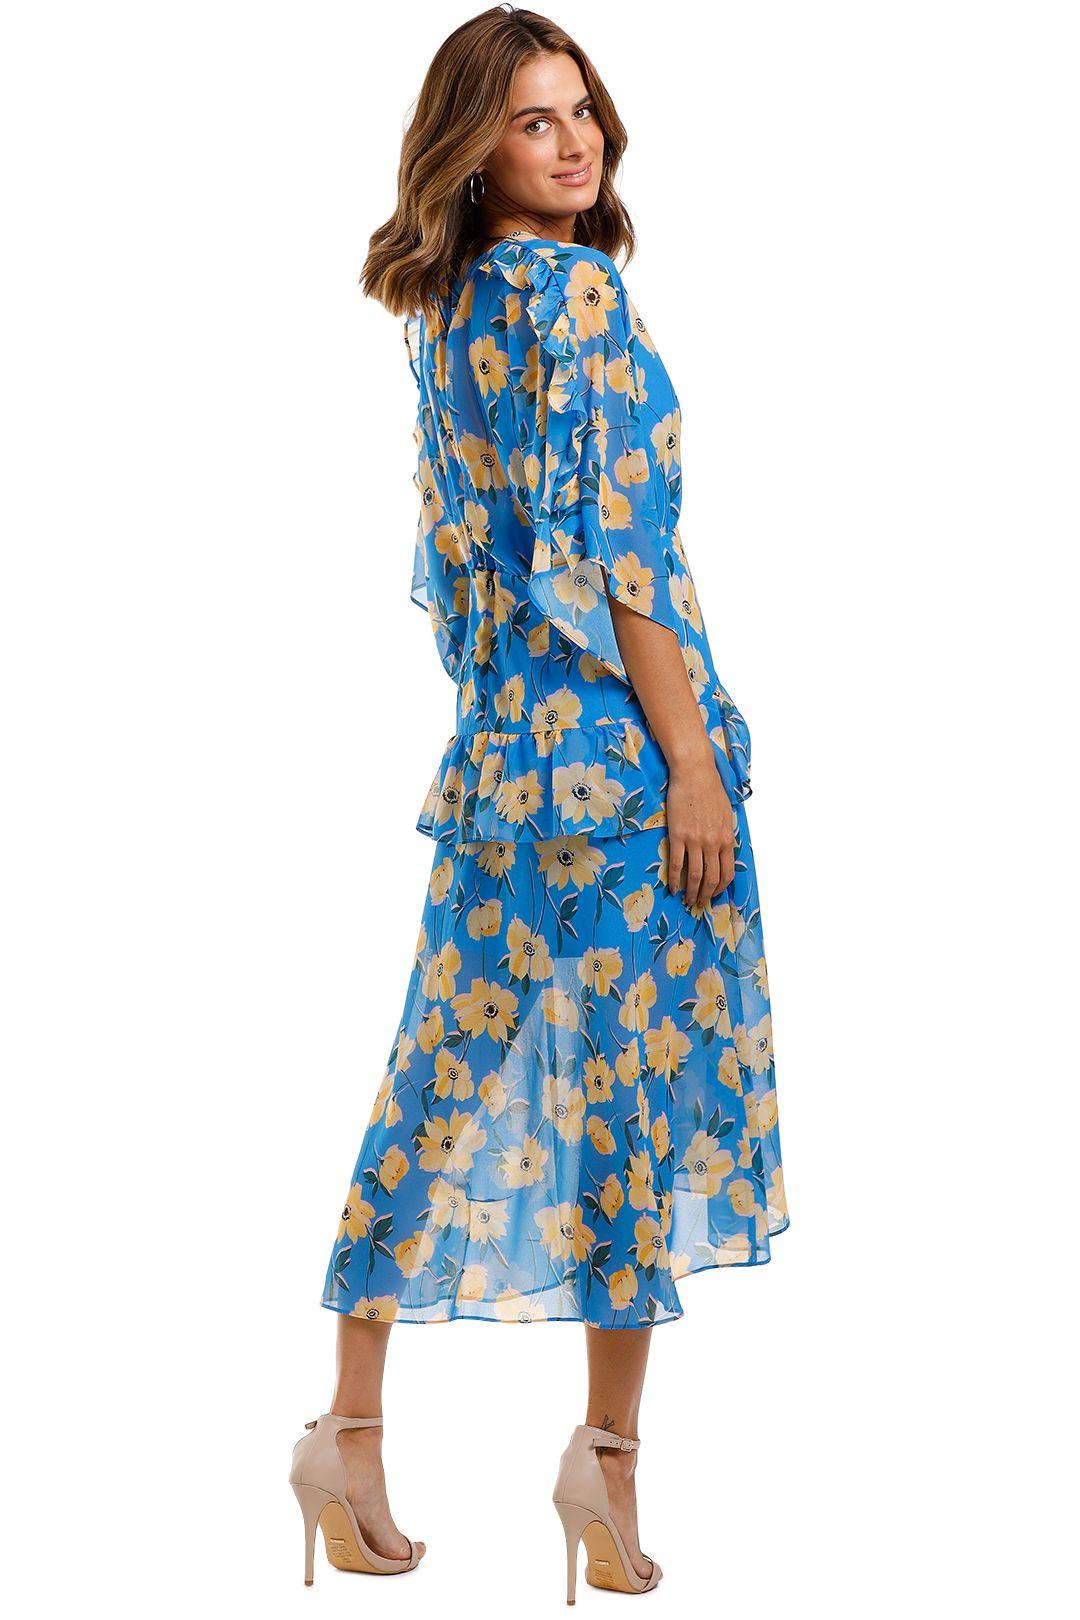 Talulah Sicily Sway Midi Dress blue multi